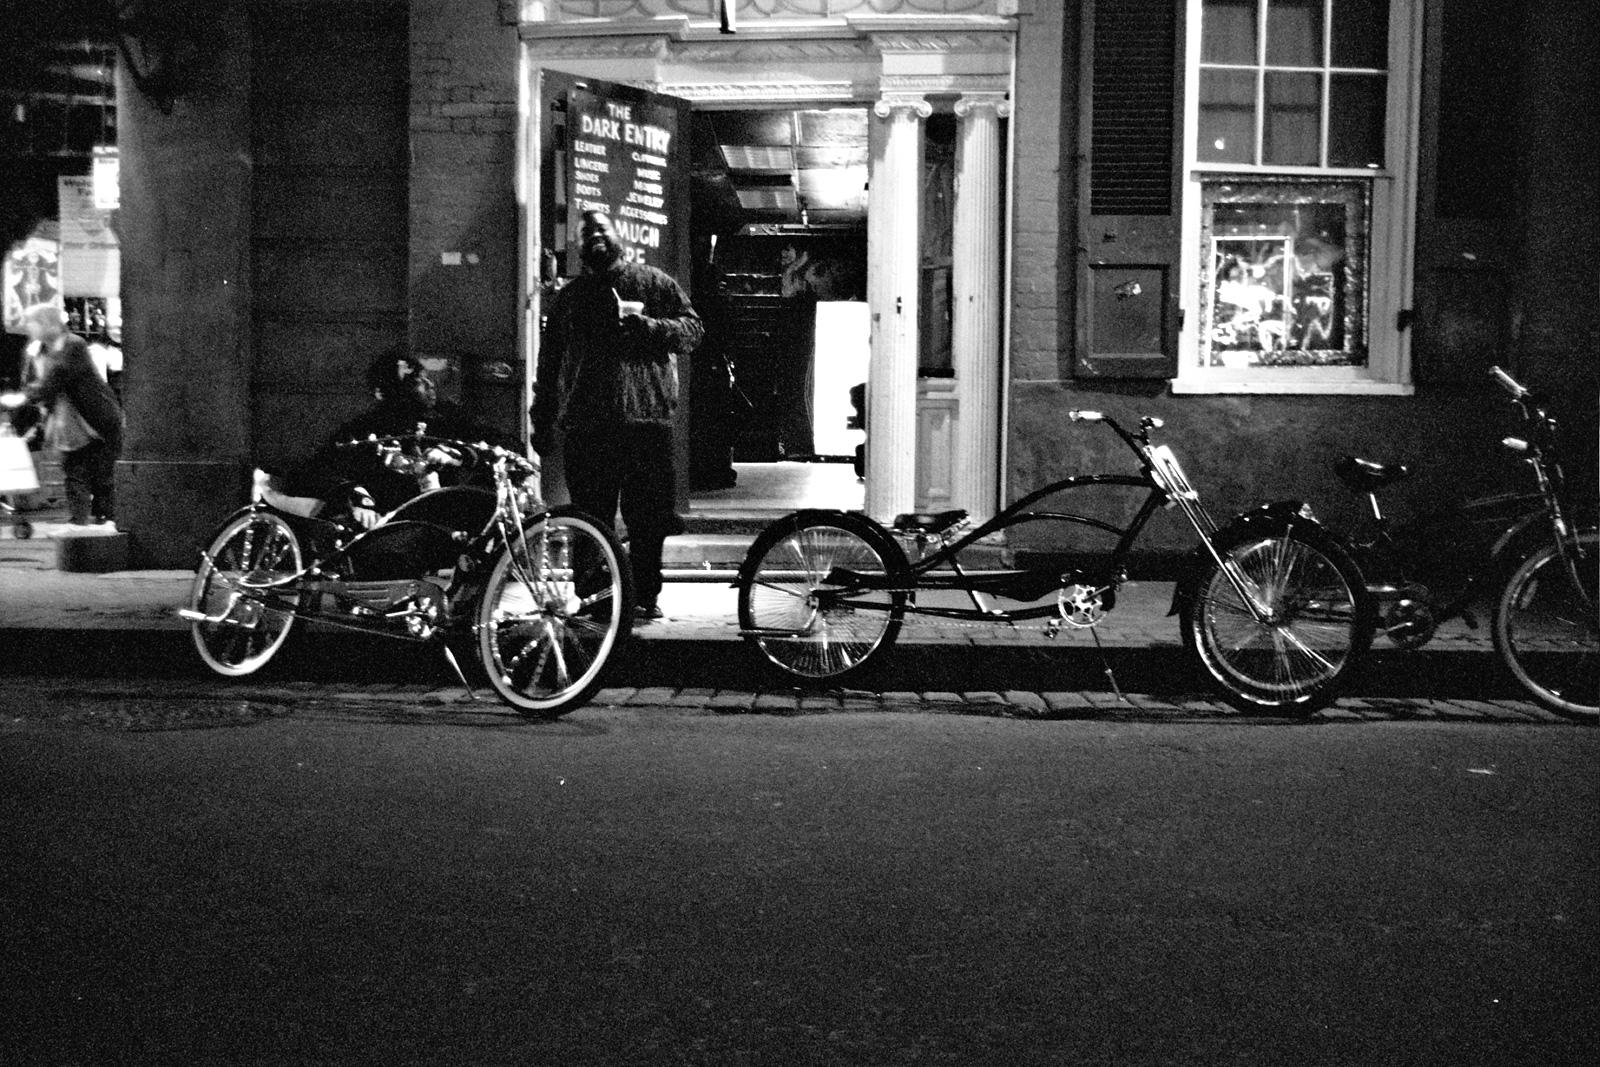 File:Lowrider Bikes New Orleans jpg - Wikimedia Commons